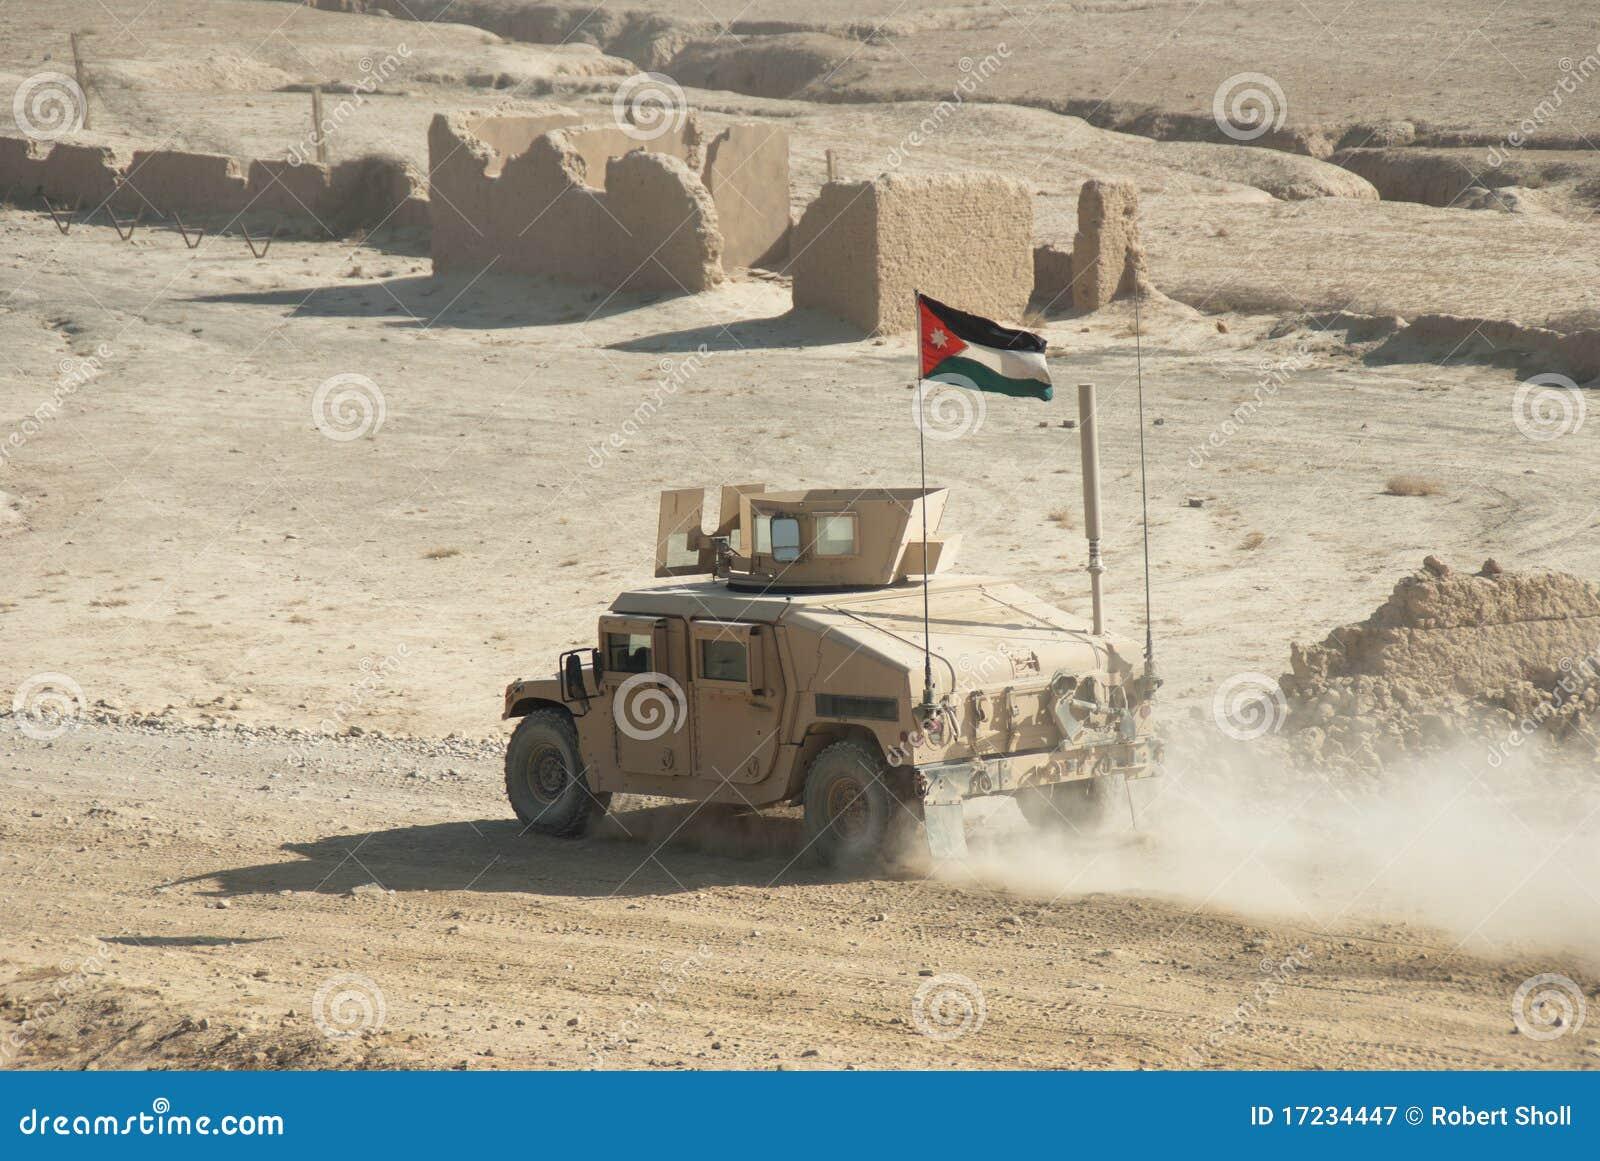 Jordanian Army Hmmwv Royalty Free Stock Photography